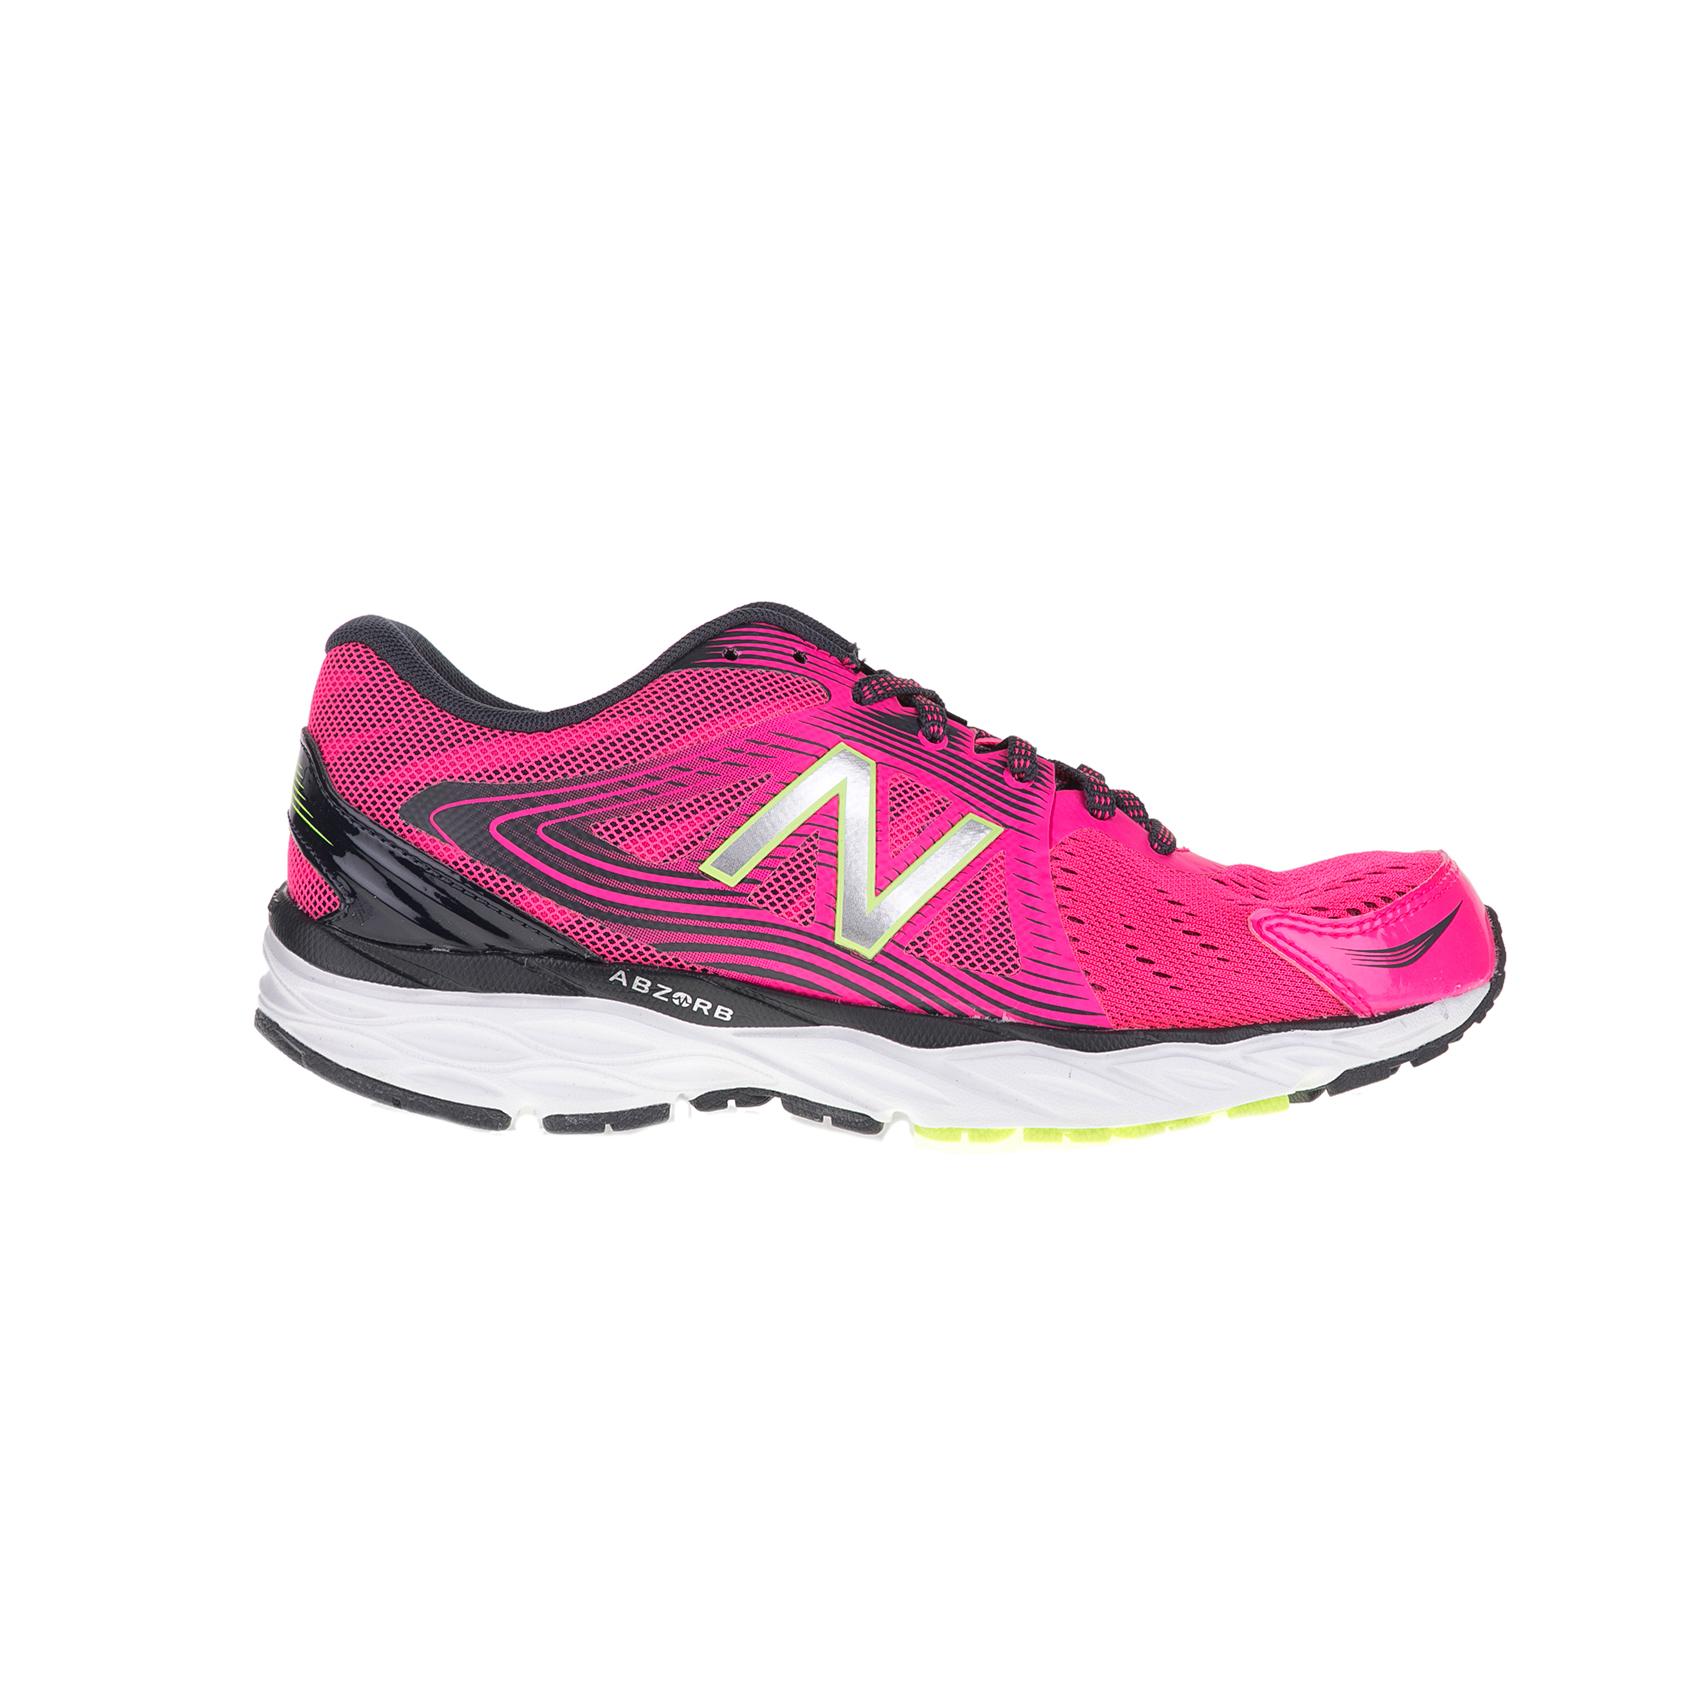 NEW BALANCE - Γυναικεία παπούτσια για τρέξιμο NEW BALANCE φούξια γυναικεία παπούτσια αθλητικά running